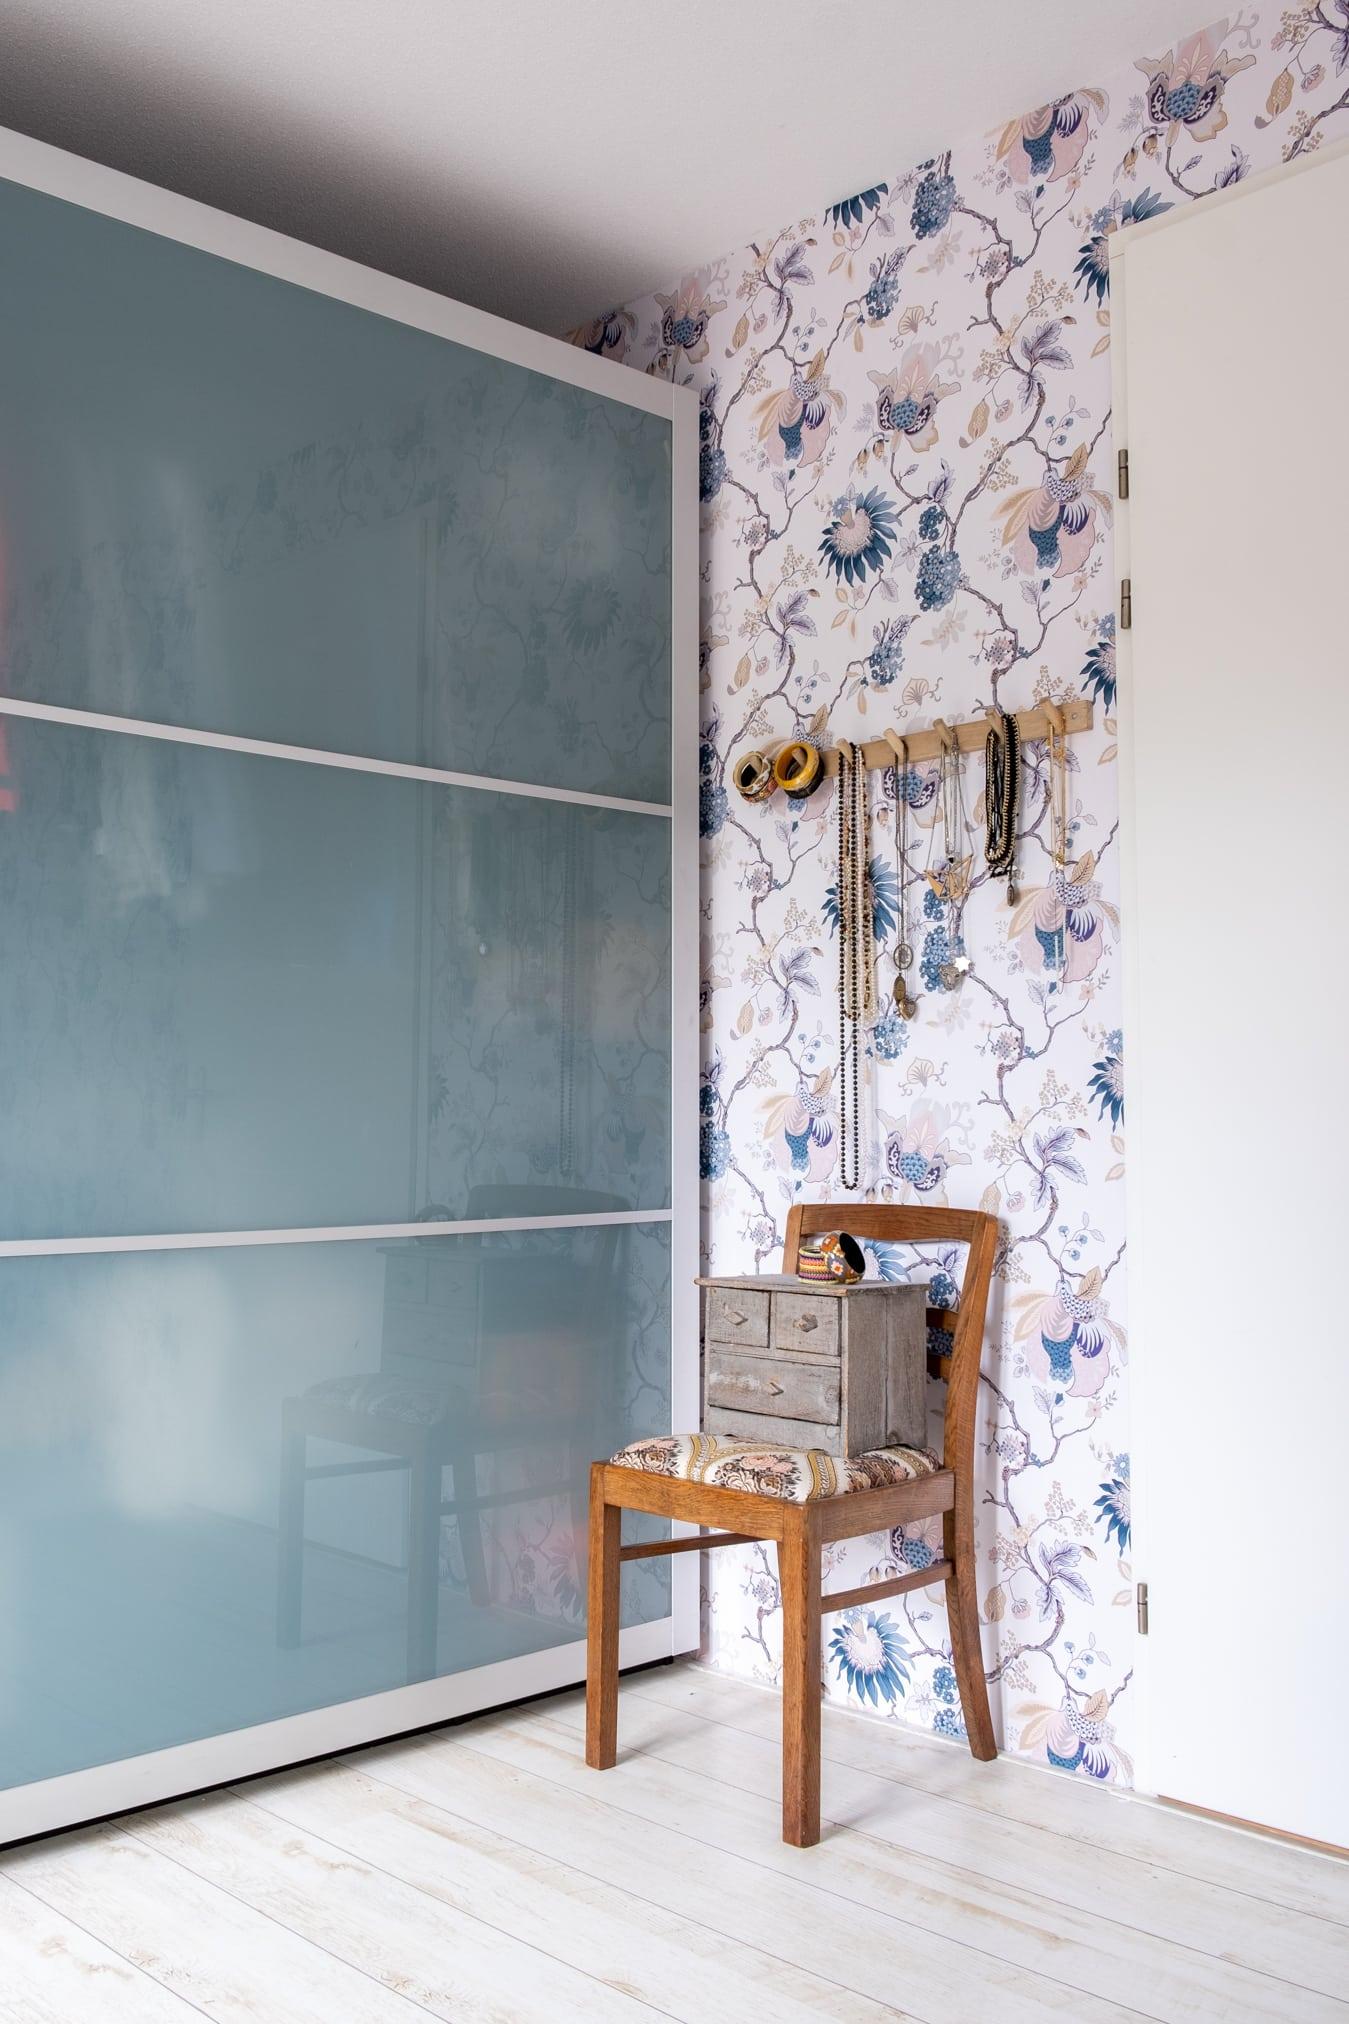 pax ikea kast romantisch interieur